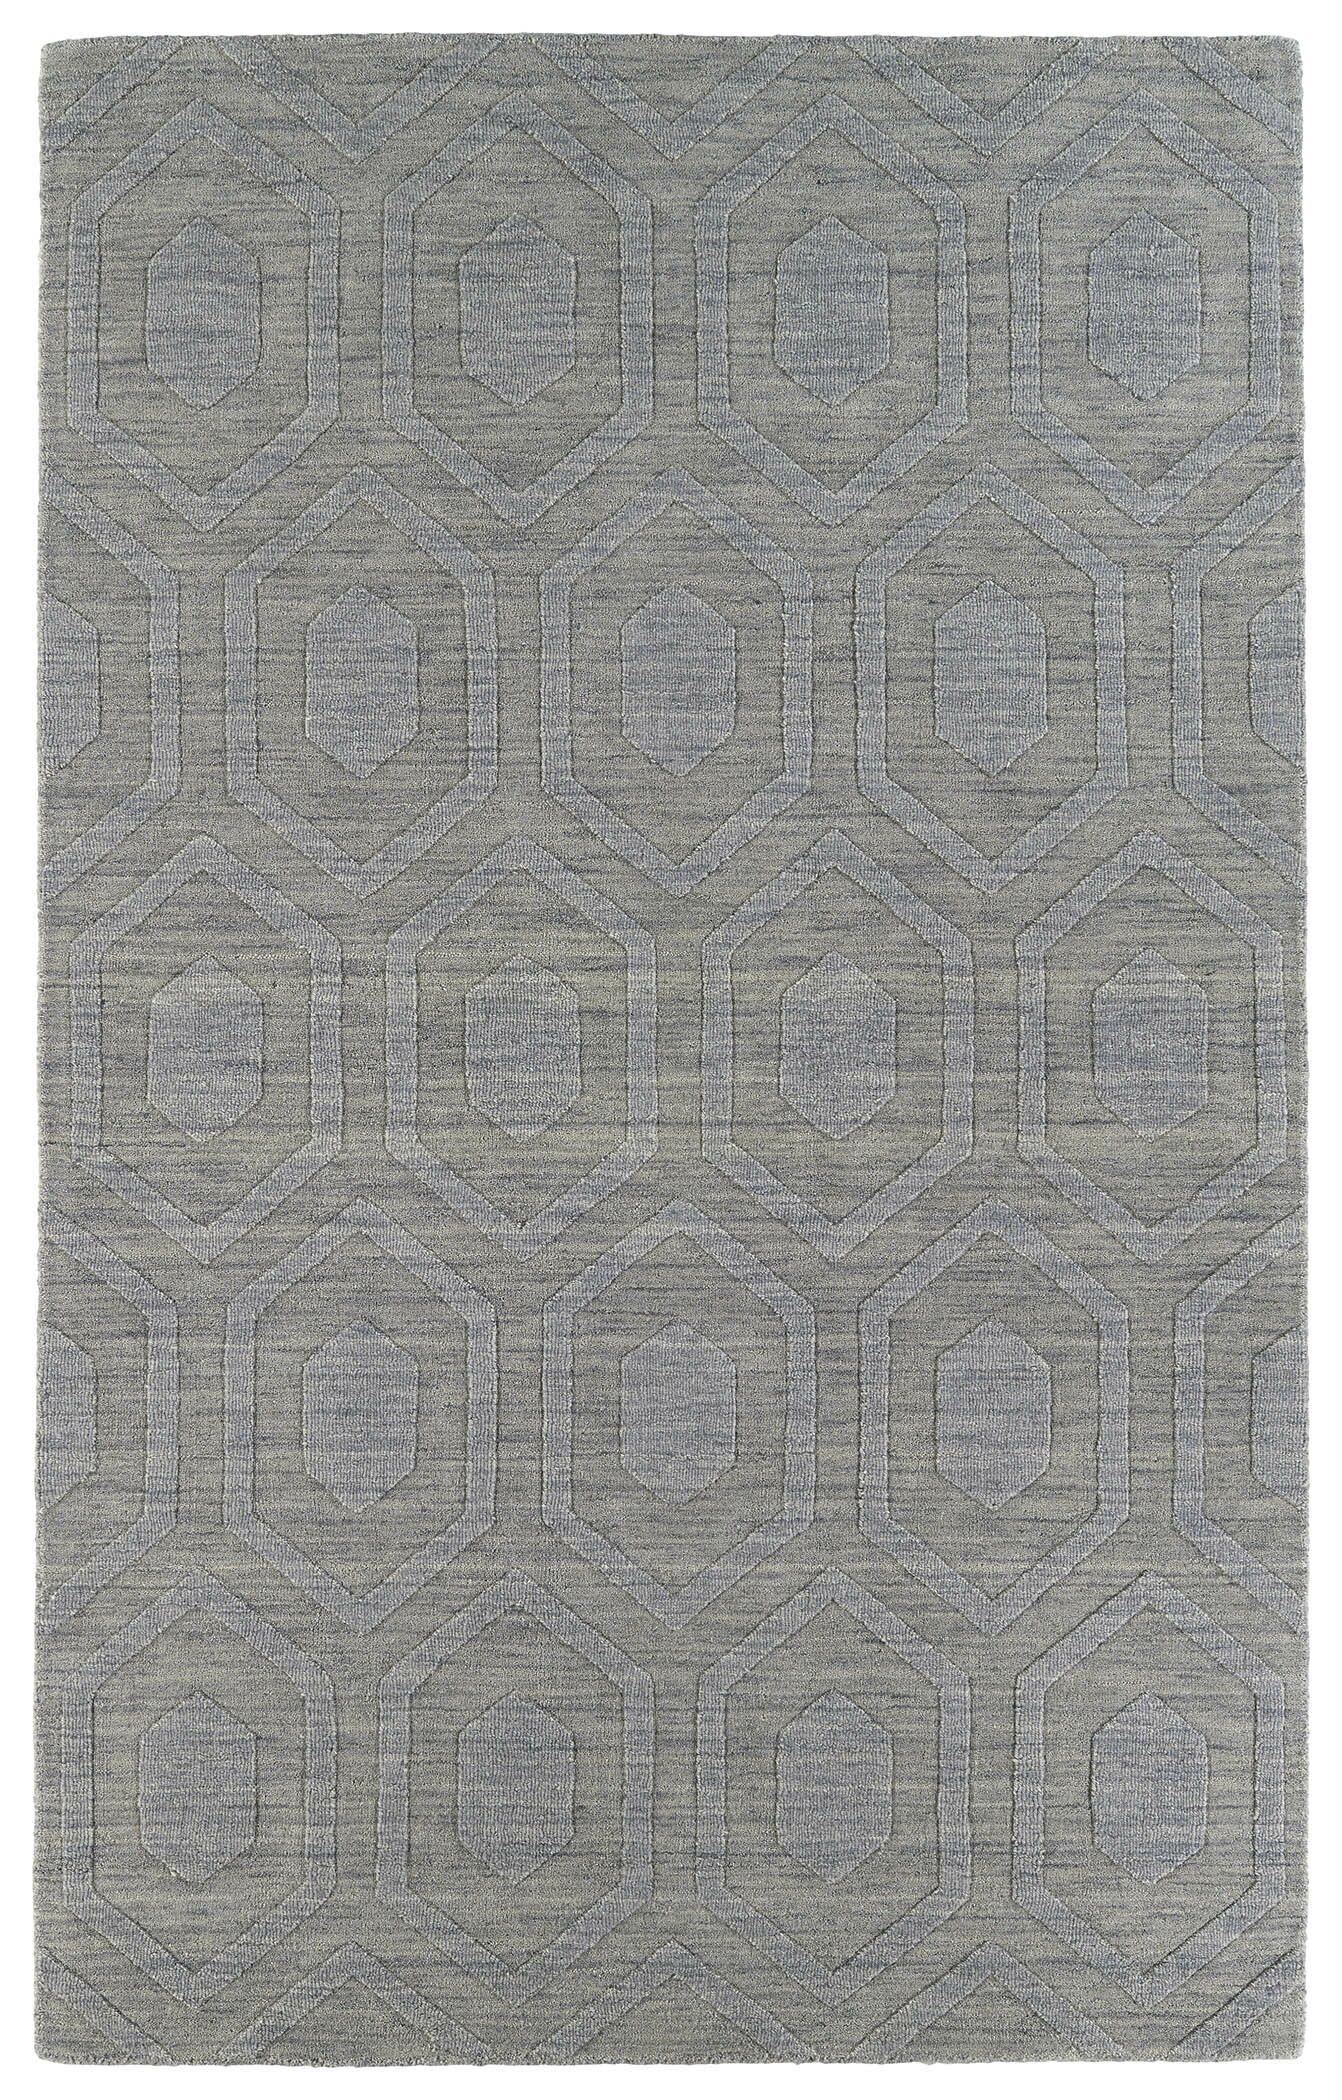 Dobson Steel Geometric Area Rug Rug Size: Rectangle 9'6